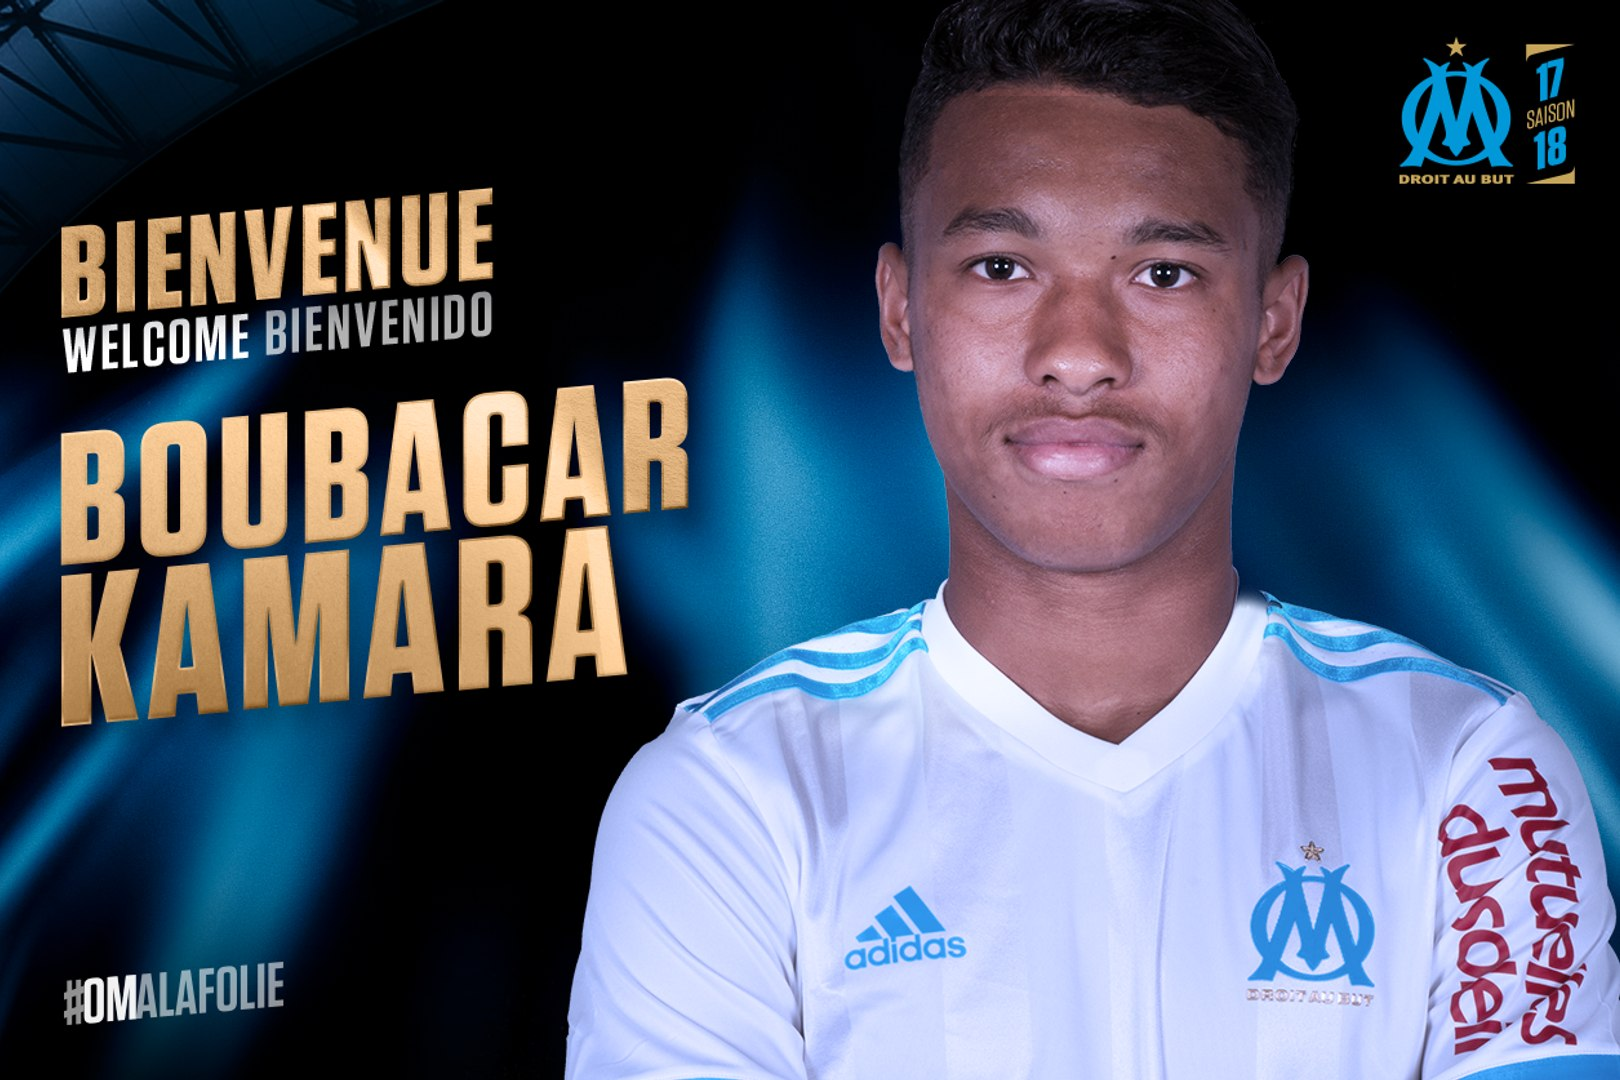 Boubacar Kamara passe pro à l'OM